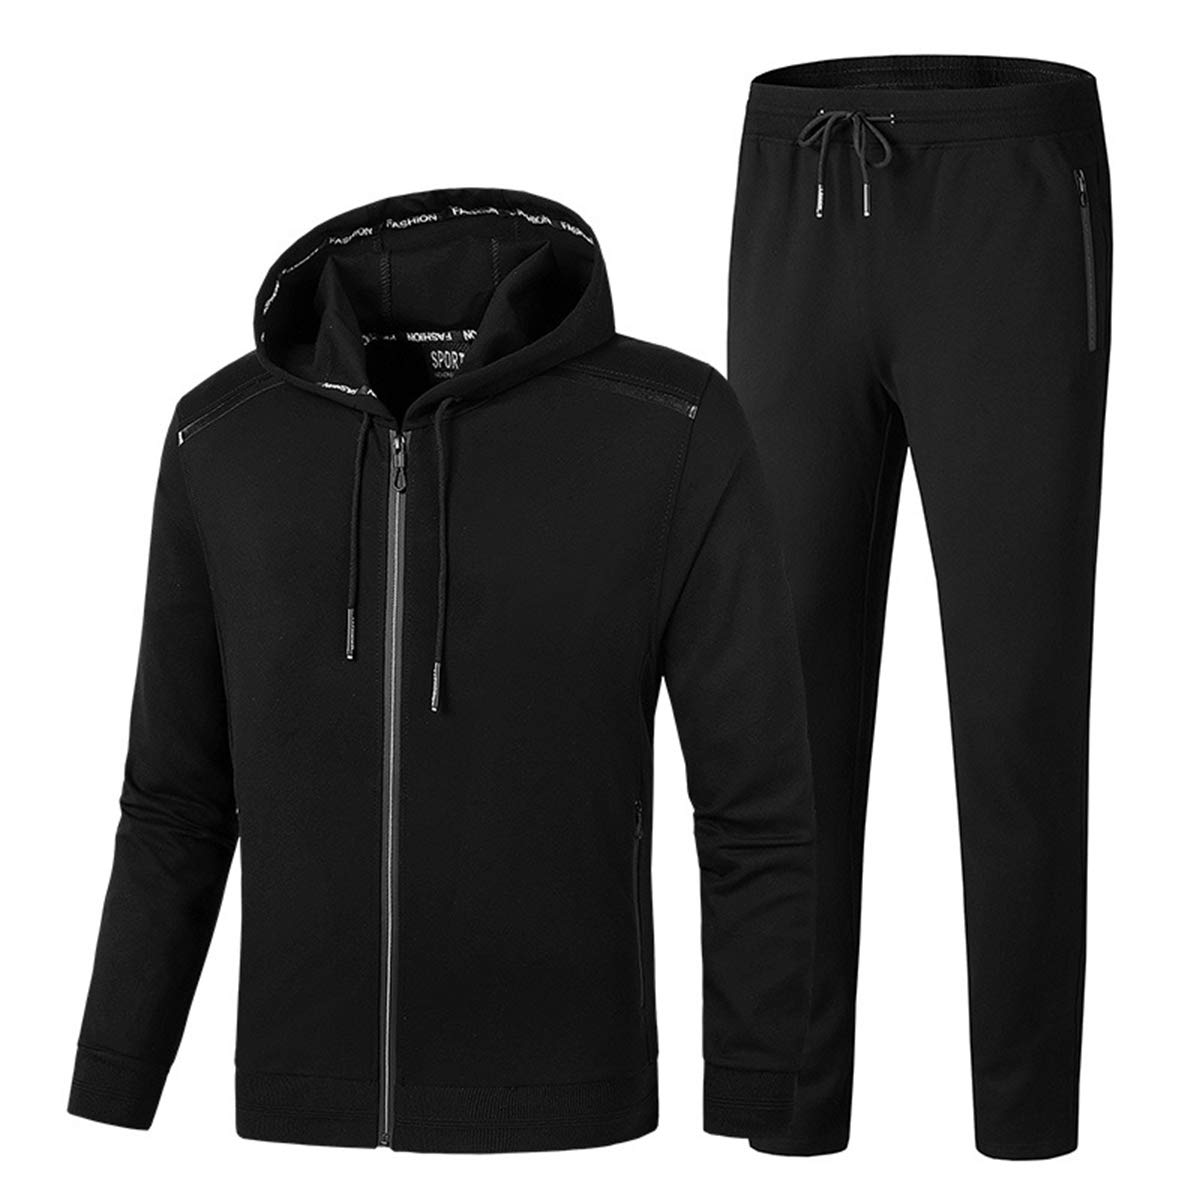 PRIJOUHE Men's Tracksuit Hooded Fitness Sport Suits Gym Hoodie 2 Piece Hoodies Joggers Sweatpants Sets Gym Jogging Tracksuits Black by PRIJOUHE